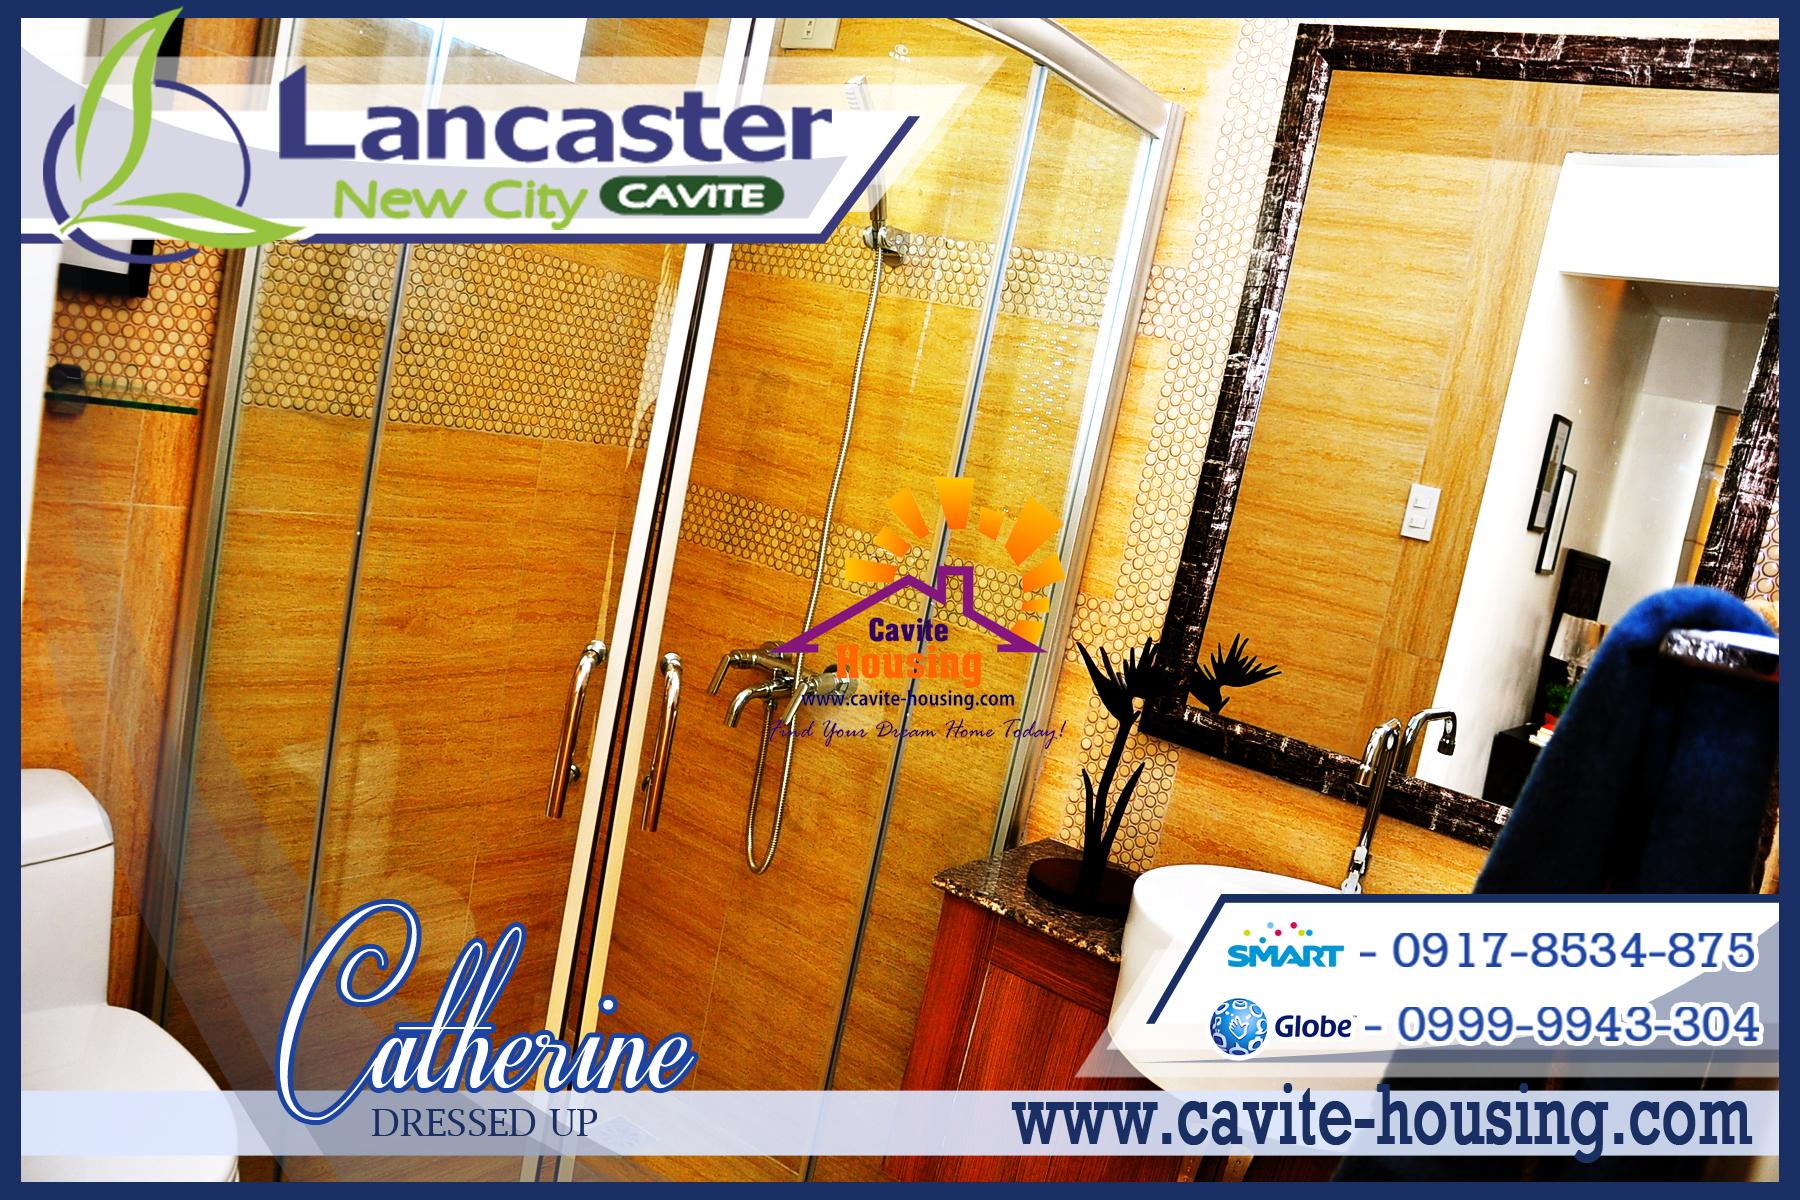 Catherine Model House Lancaster Catherine Model House Turn